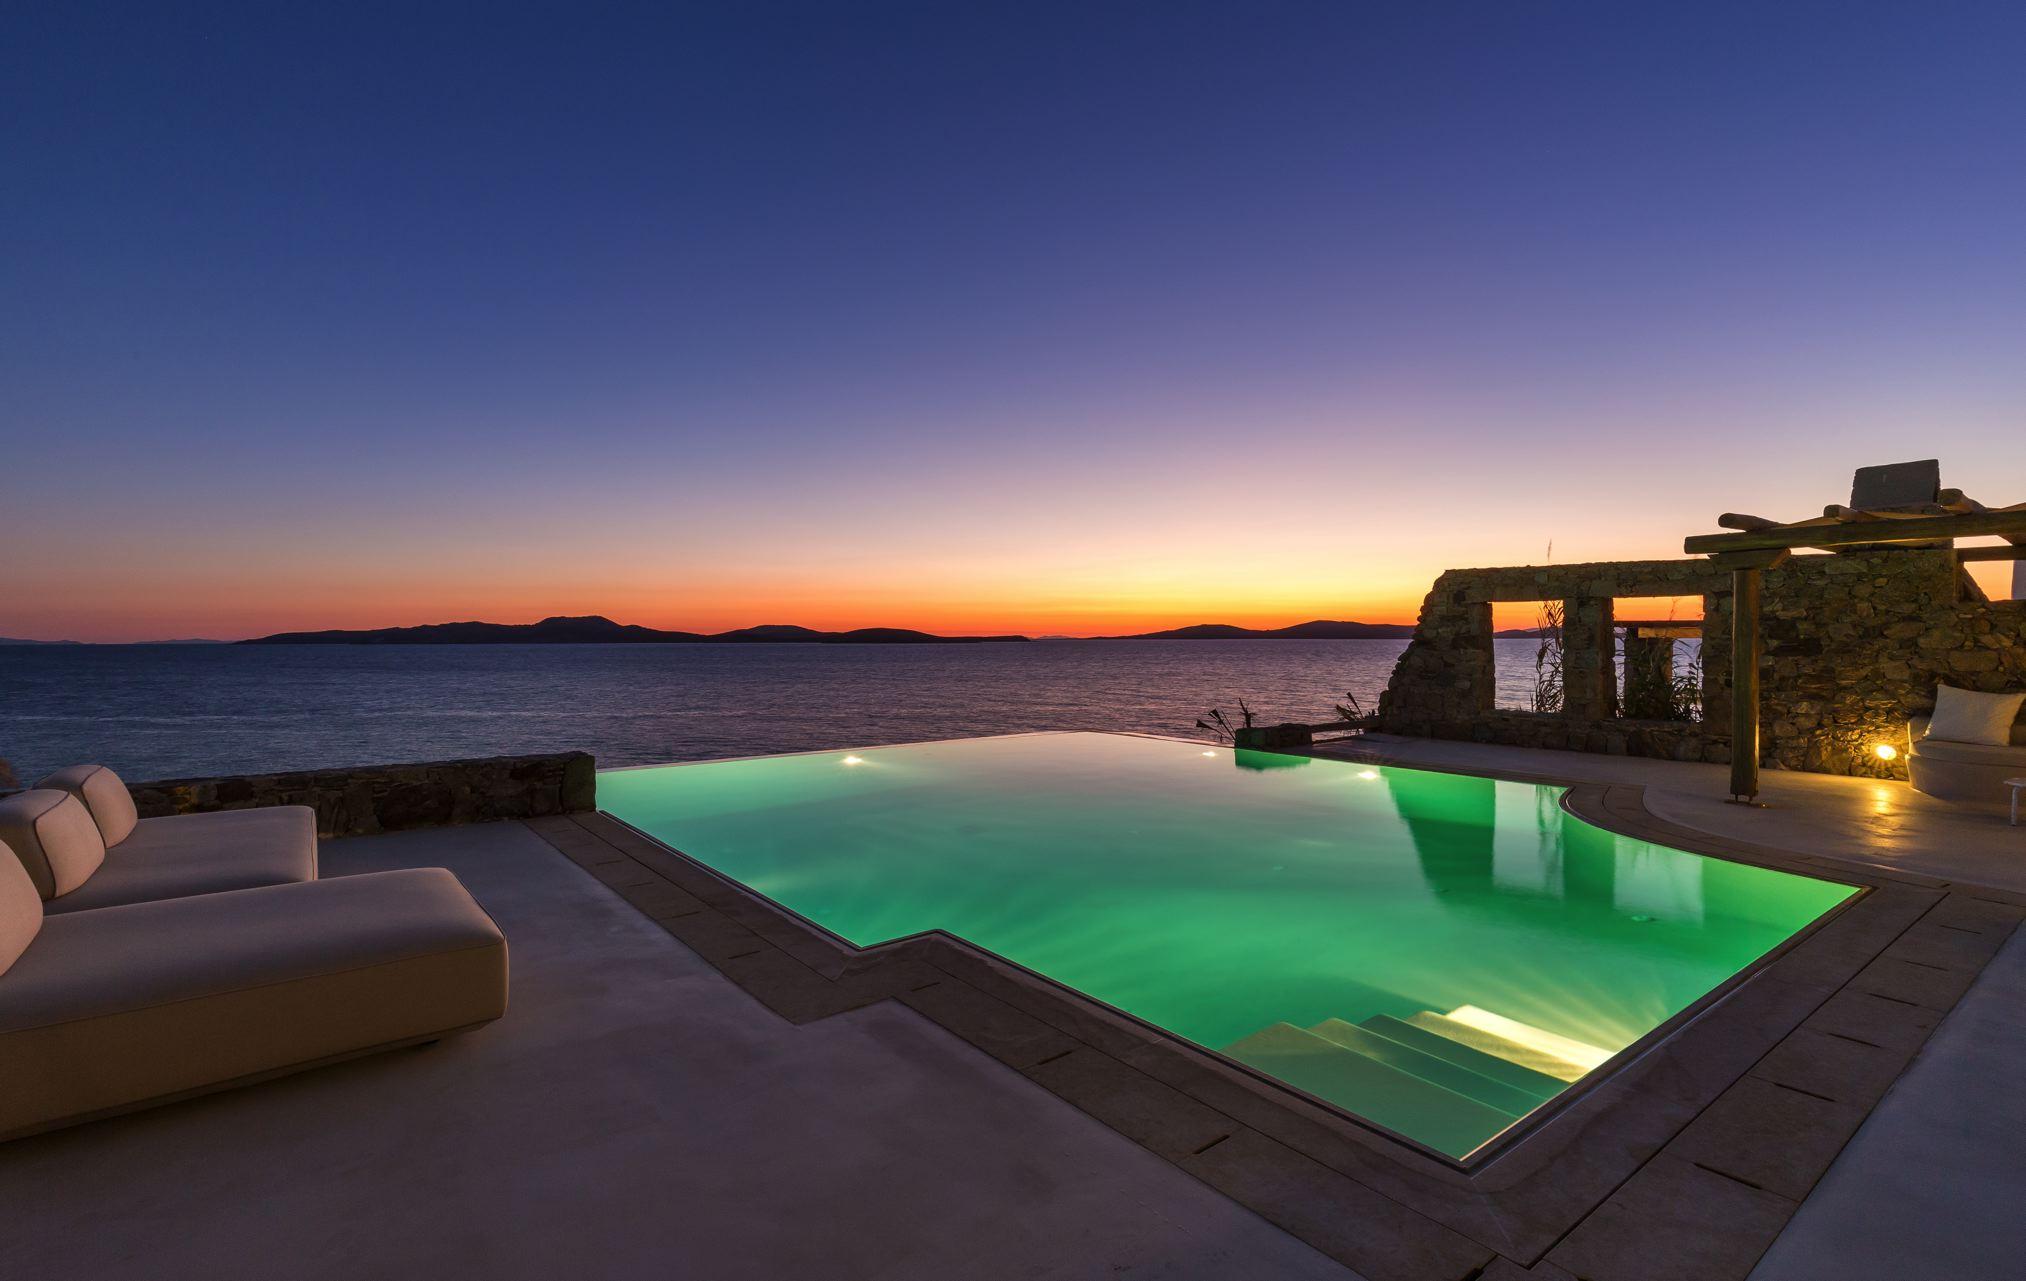 Villa Okyroe, Agios Ioannis Beach, Mykonos, Greece